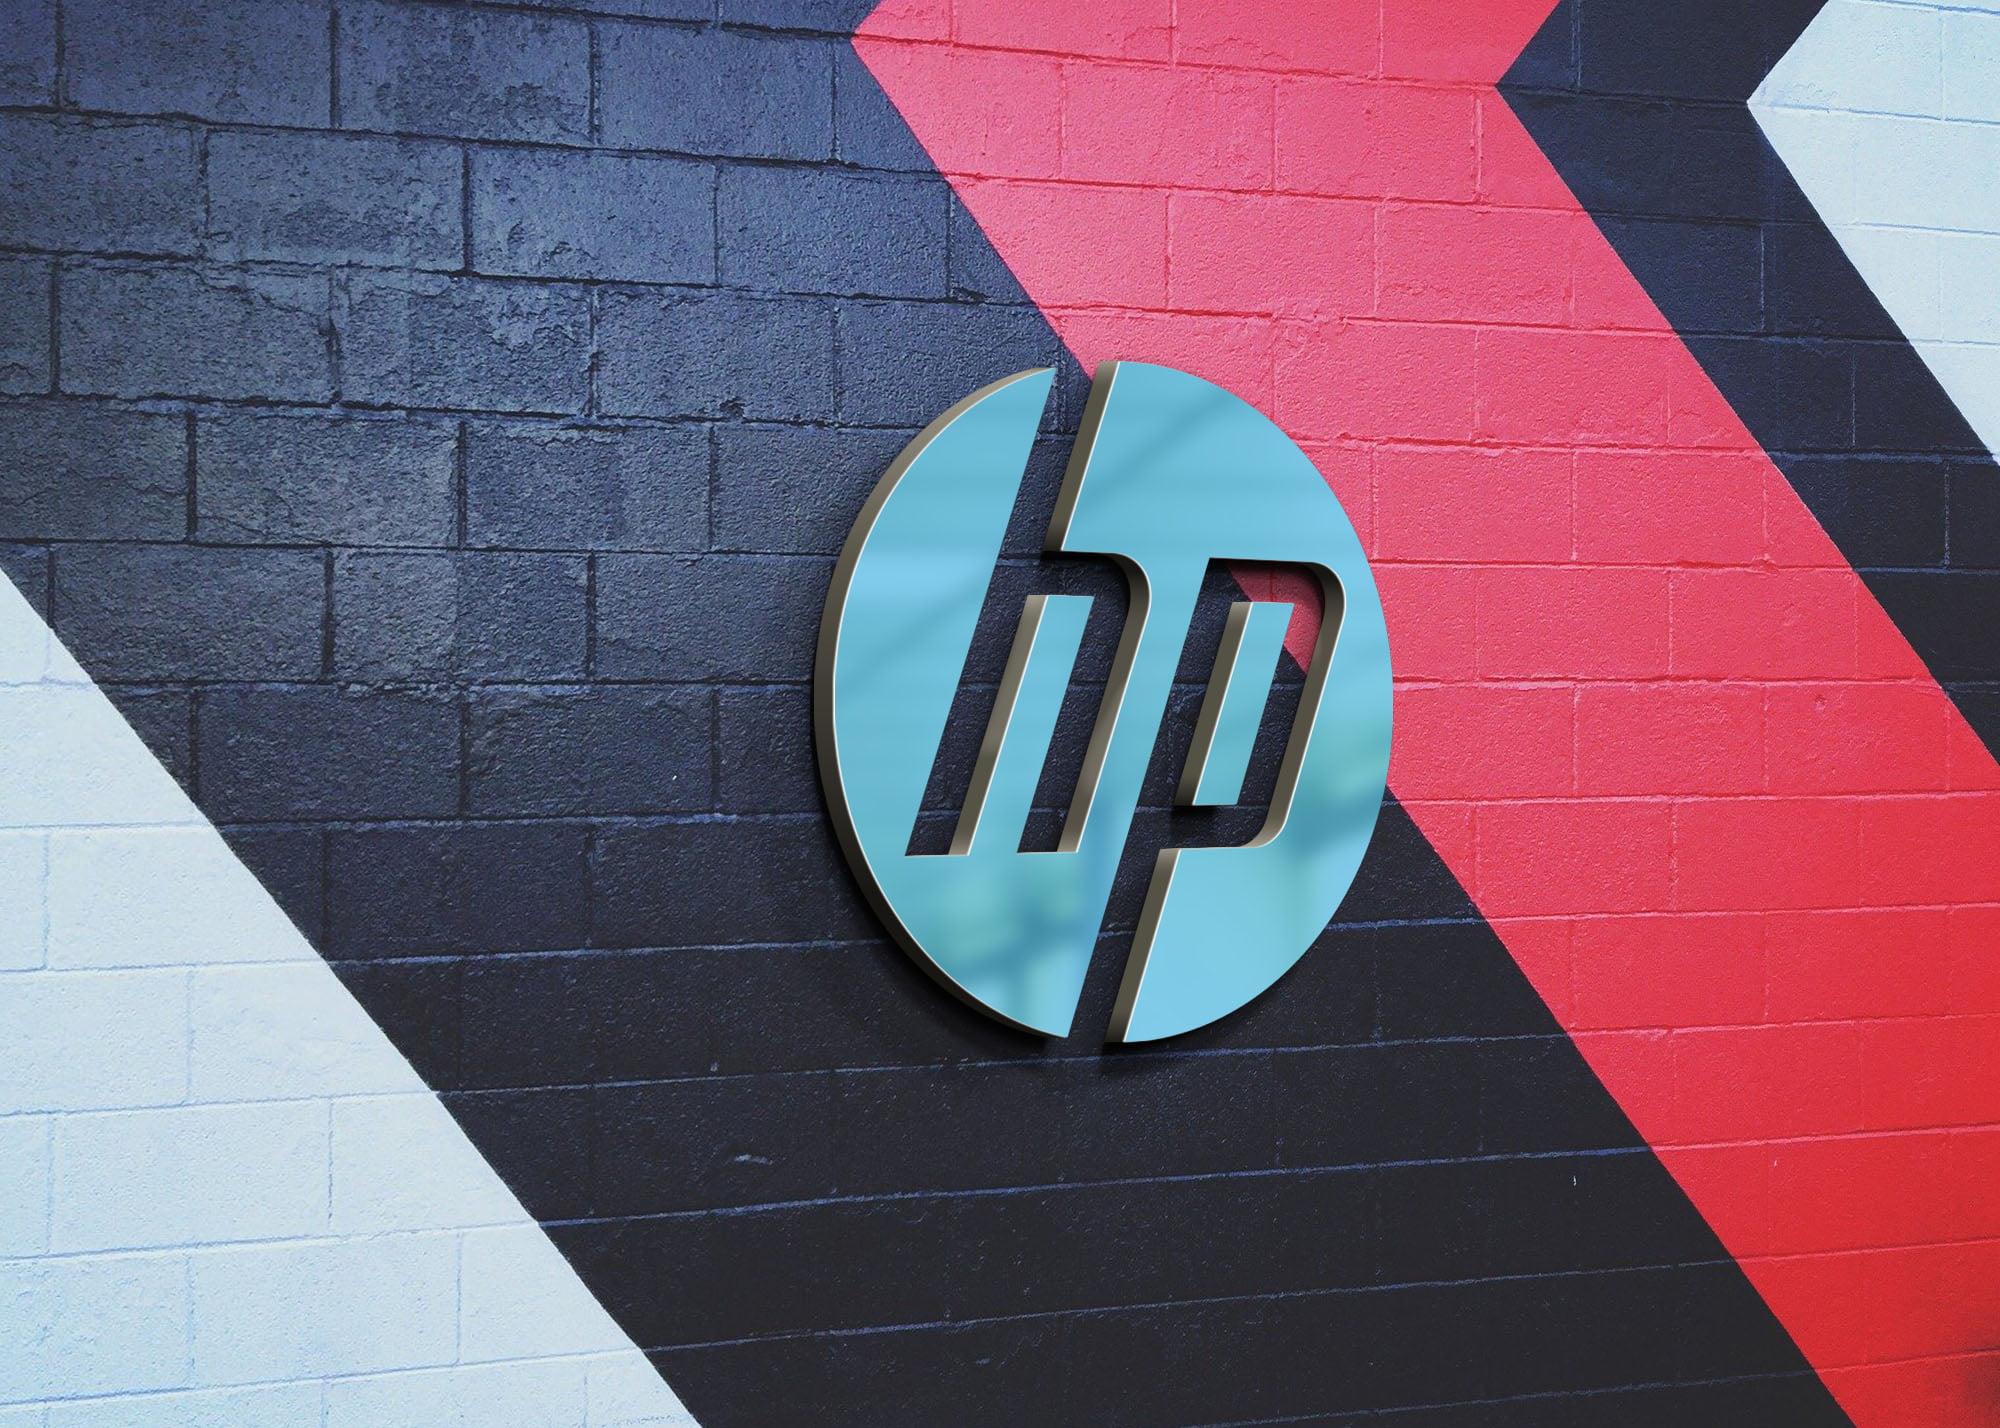 HP 3d metal on wall mockup